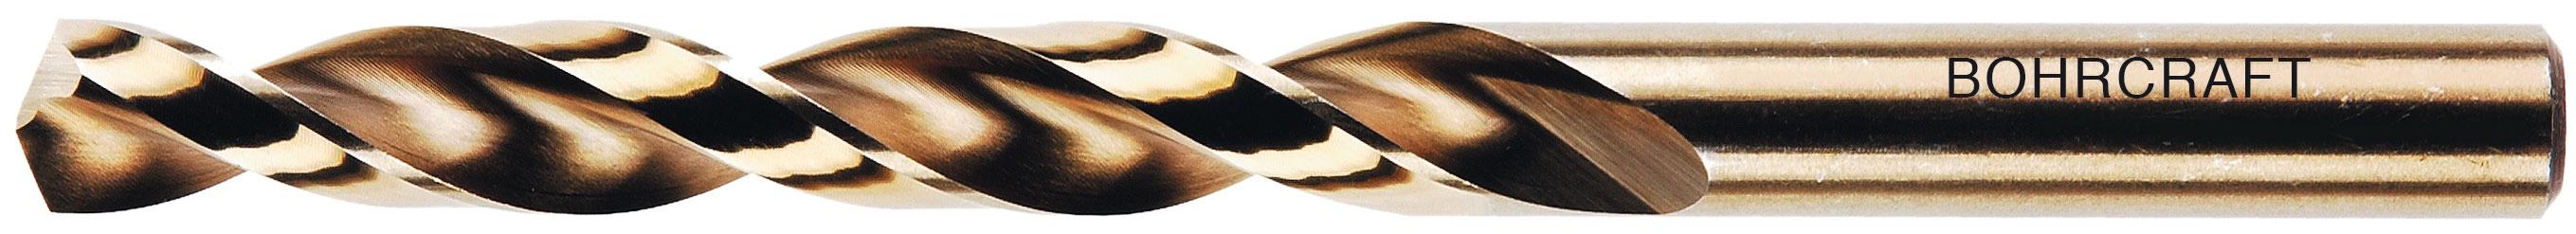 Bohrcraft Spiral Drill Bit DIN 338/HSS-G Ground Split Point Type N 11200100290 9.5/mm BC Quadro Pack of 10